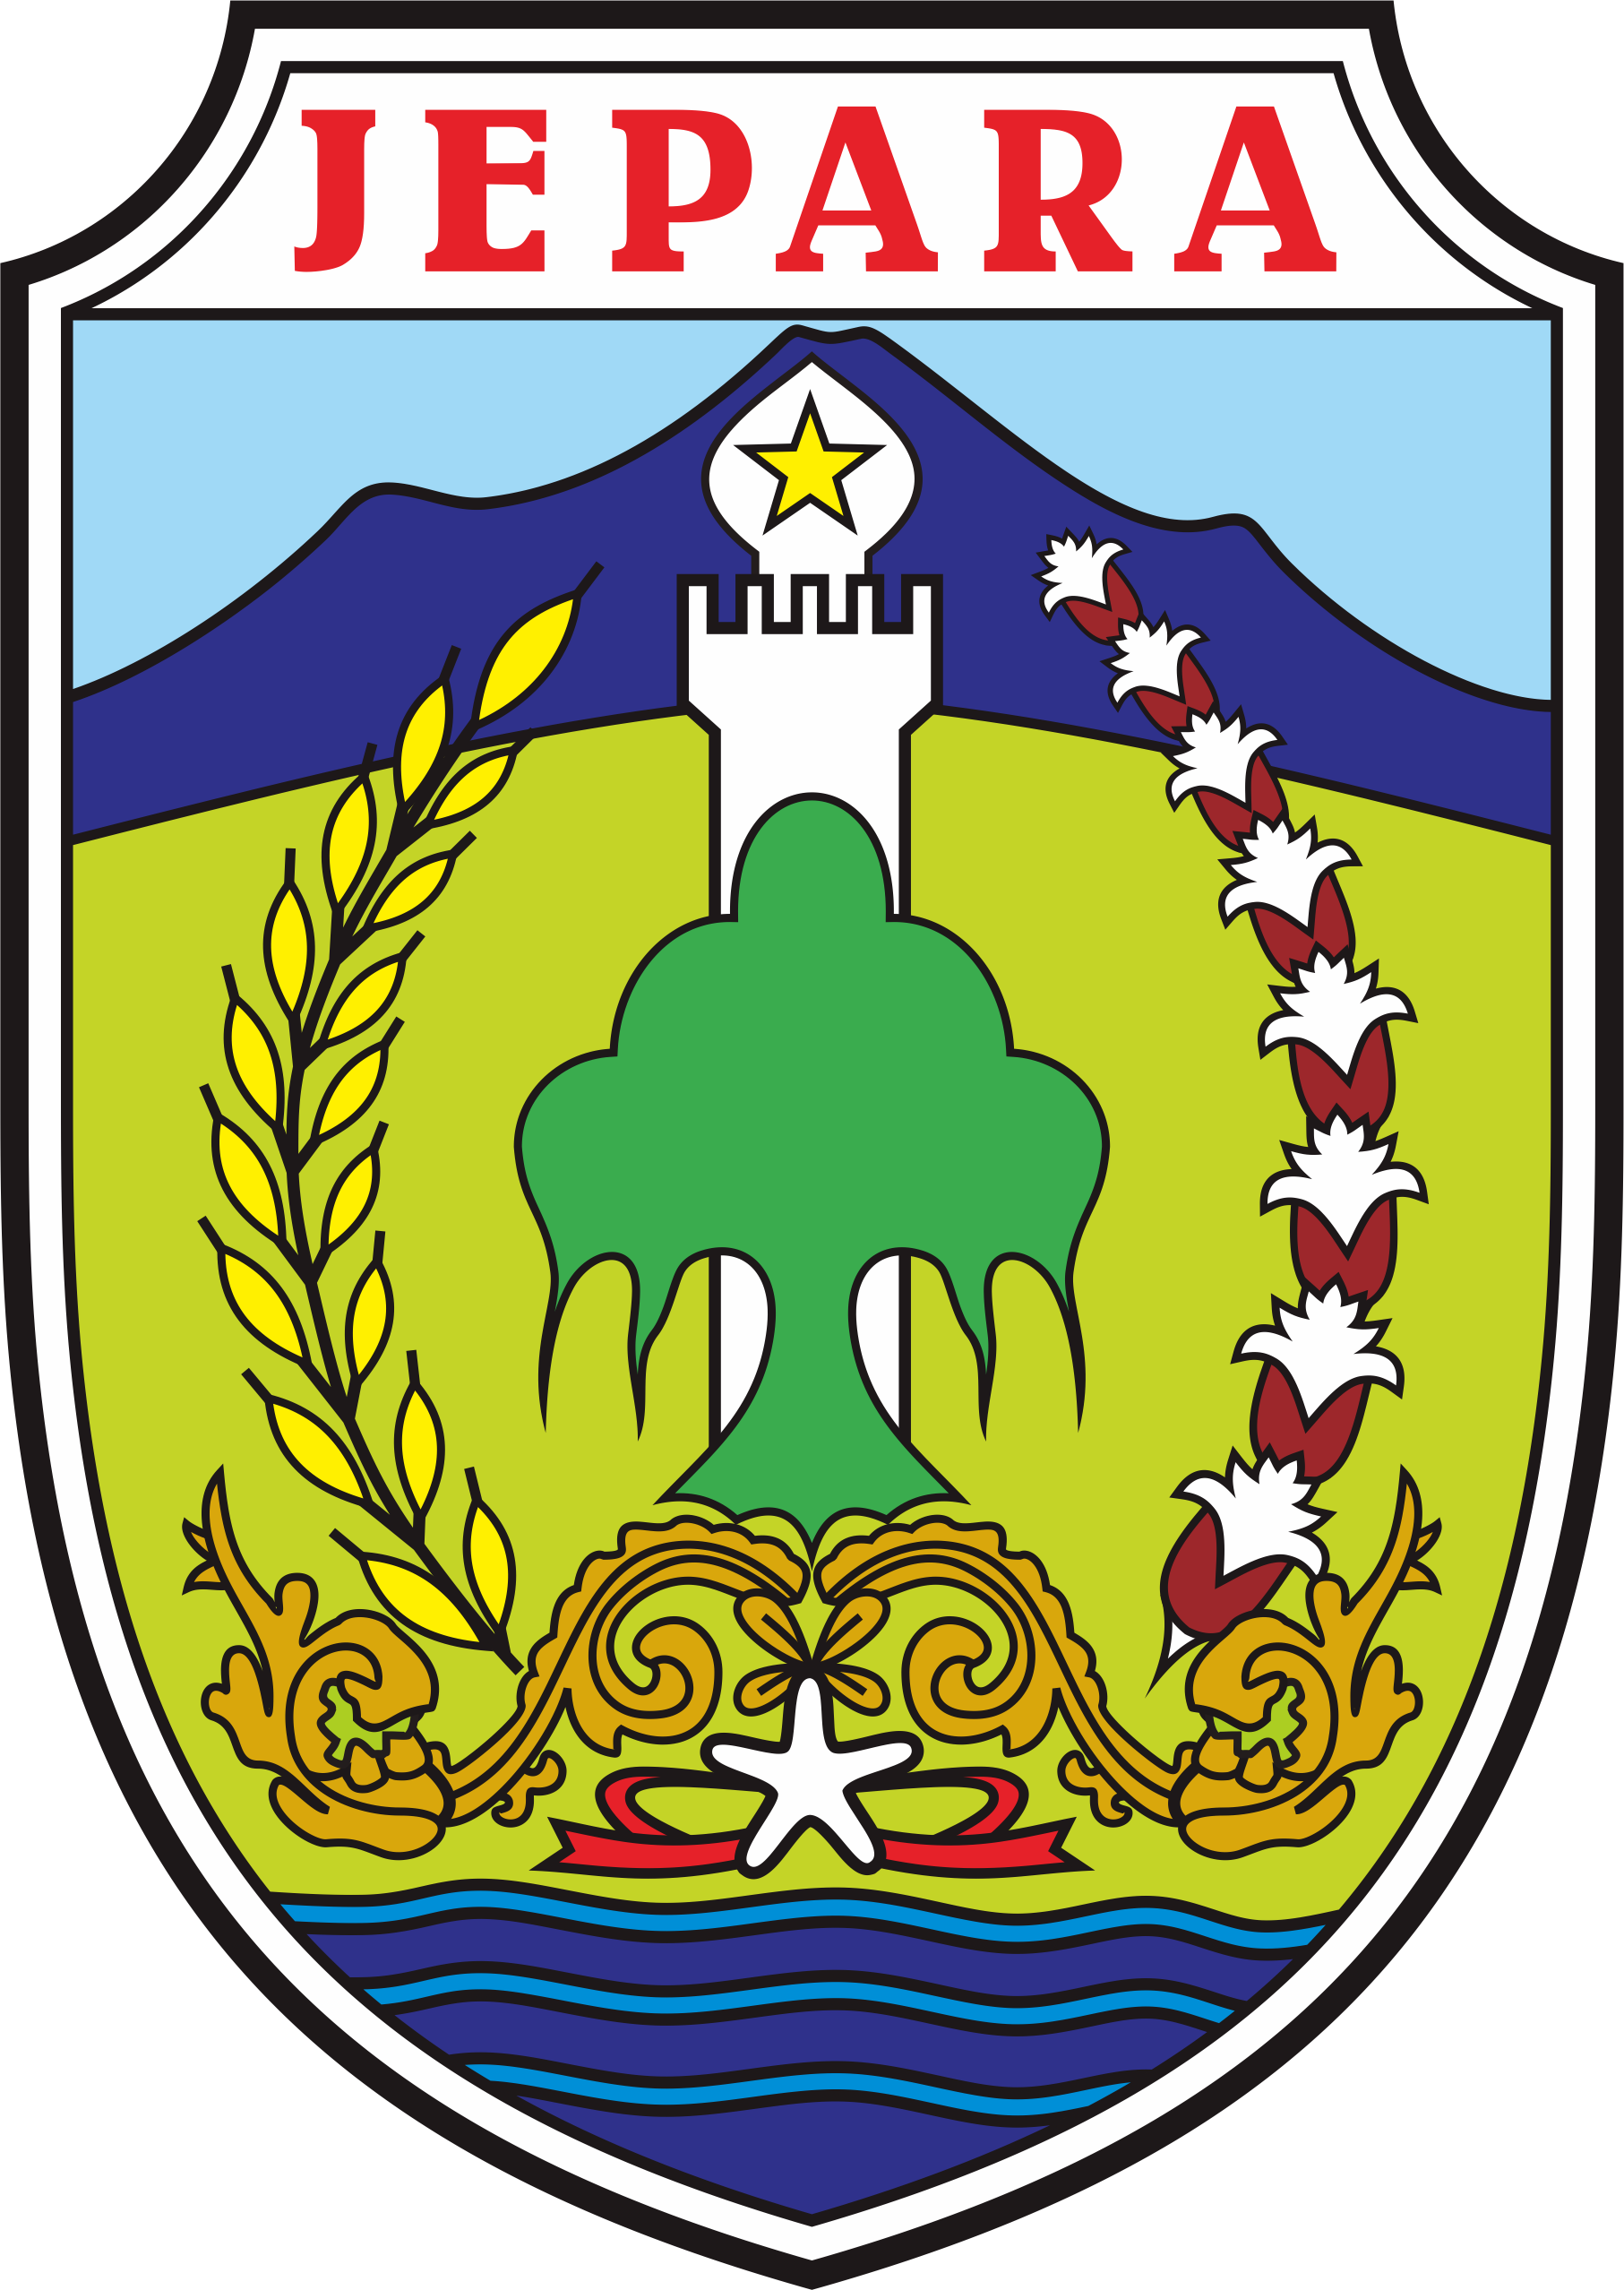 14. Jepara Indonesia, Kota